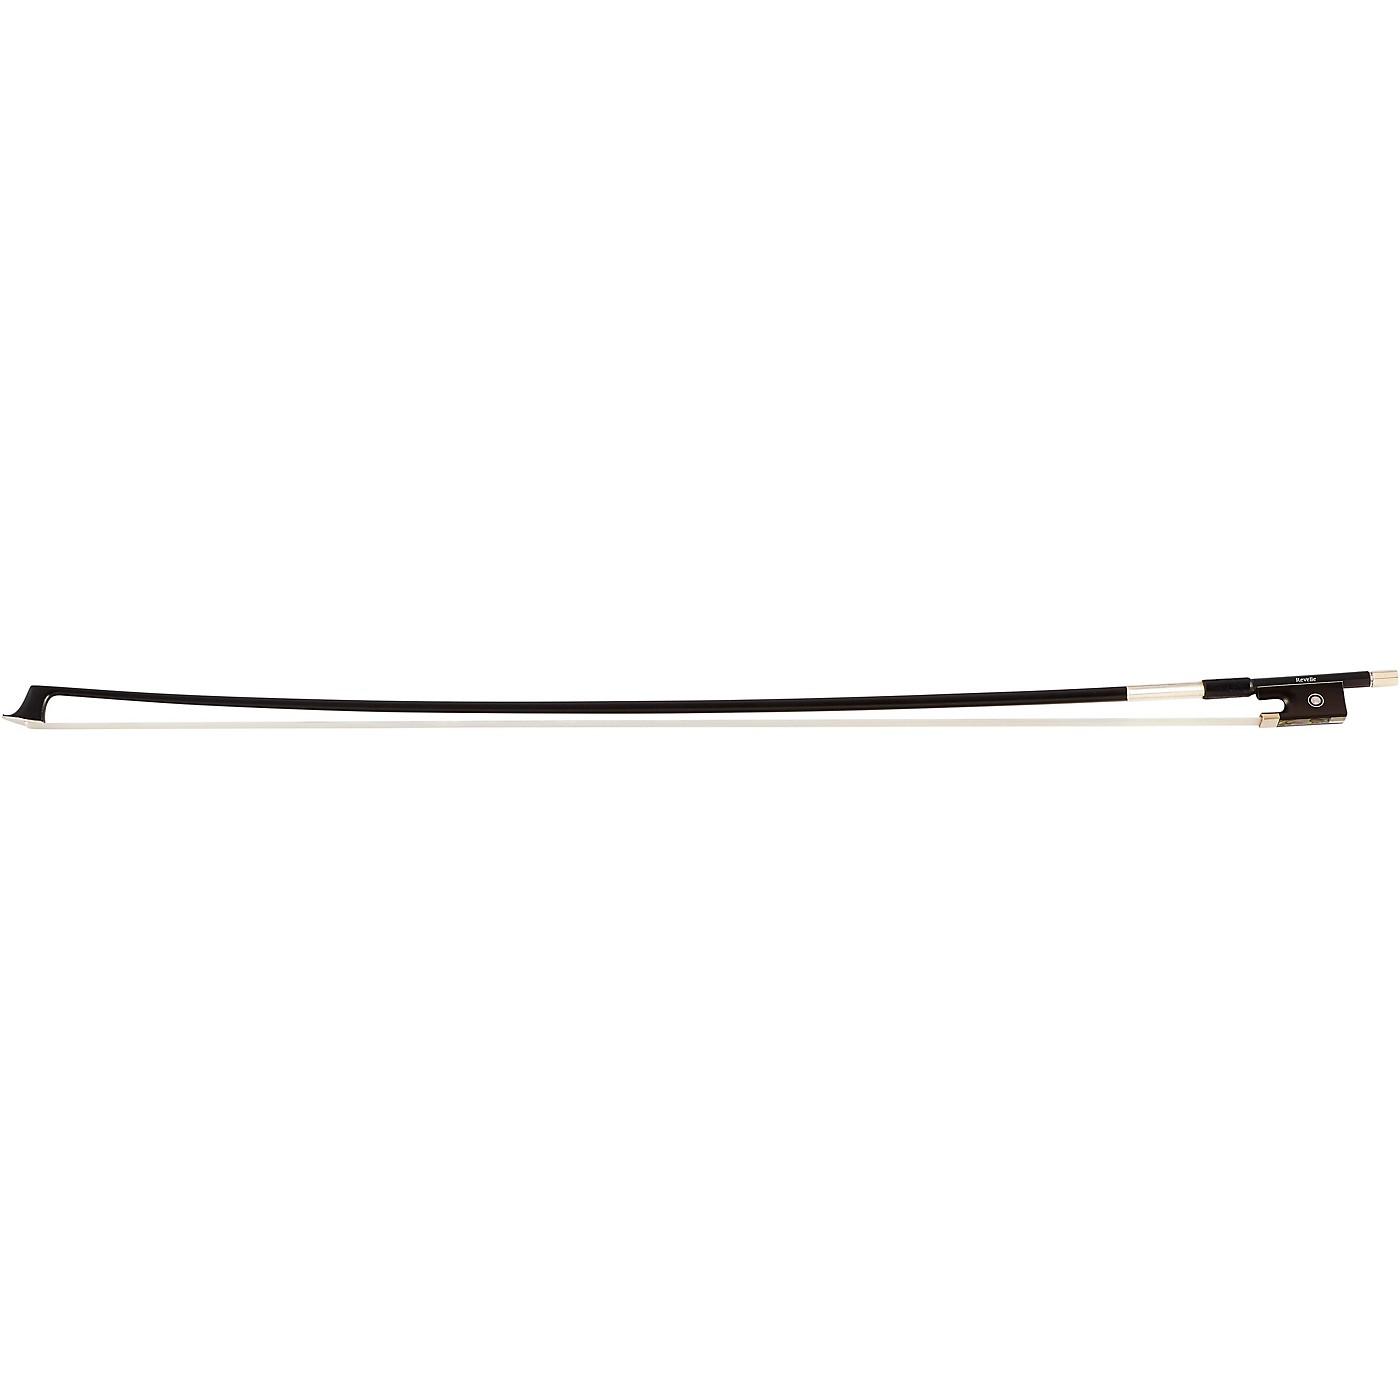 Revelle Rook Carbon Fiber Violin Bow with Coruss Hair thumbnail